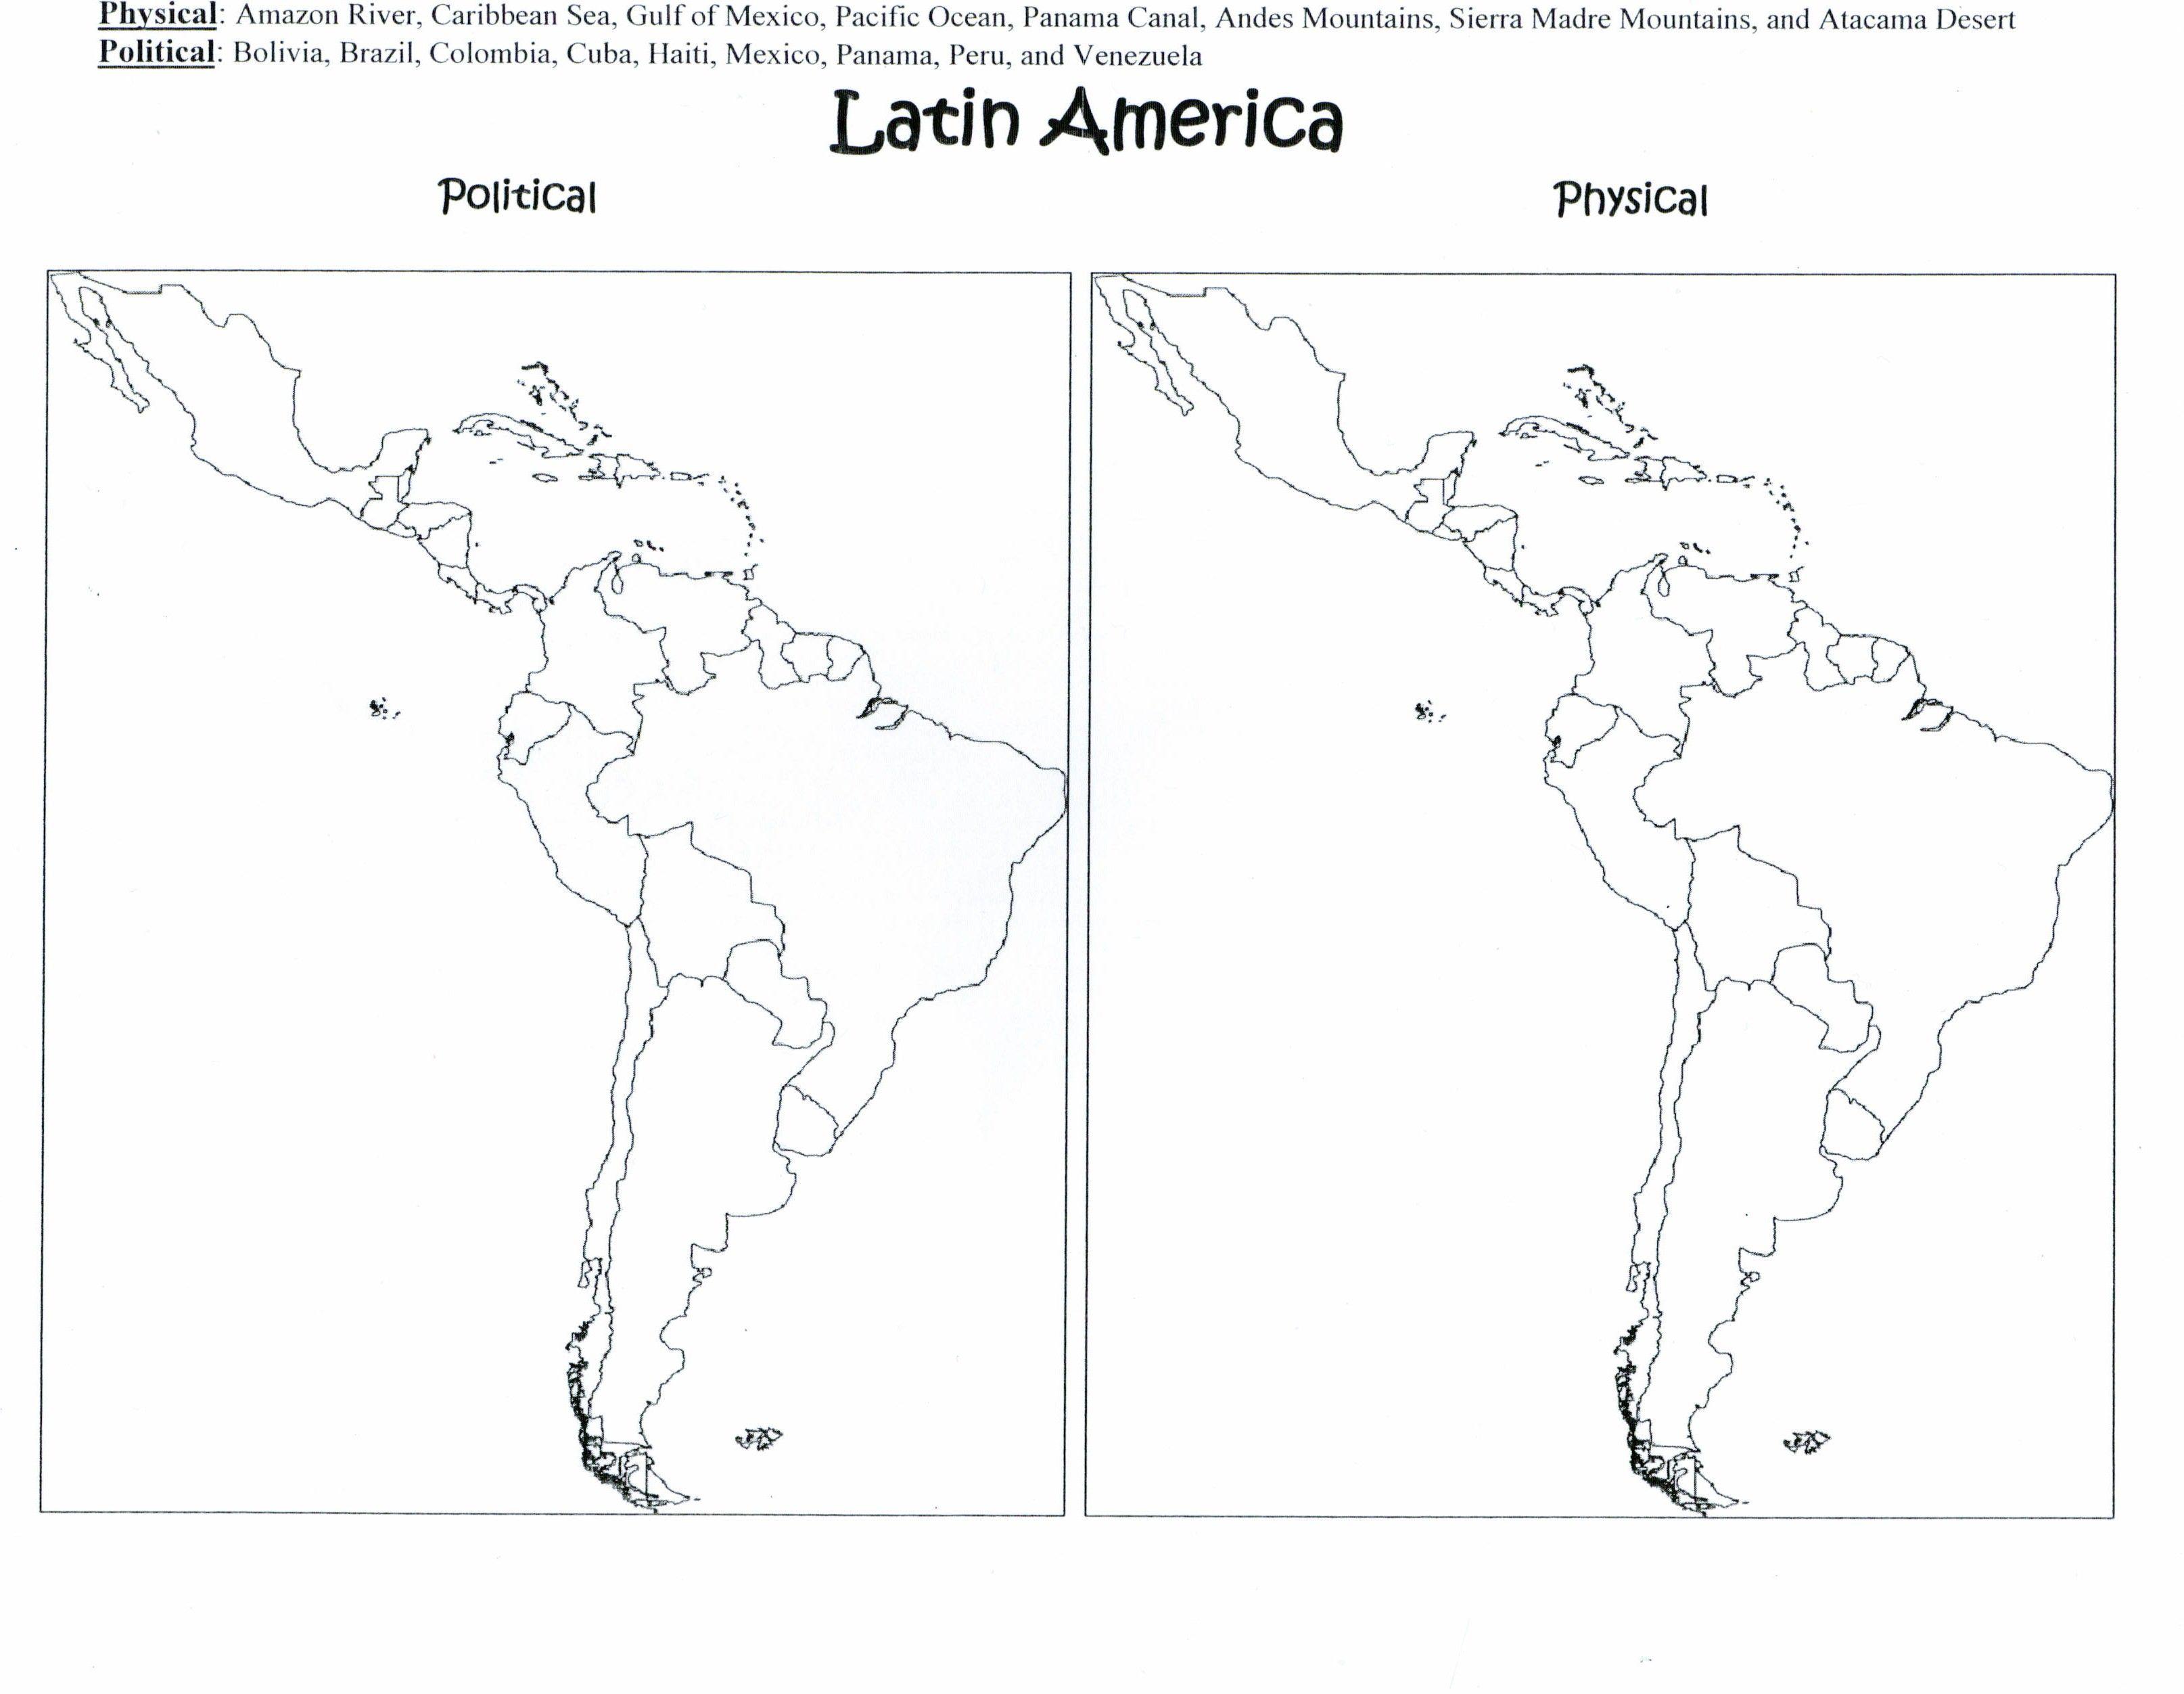 Latin America Politcal Amp Physical Maps Handout 3 229